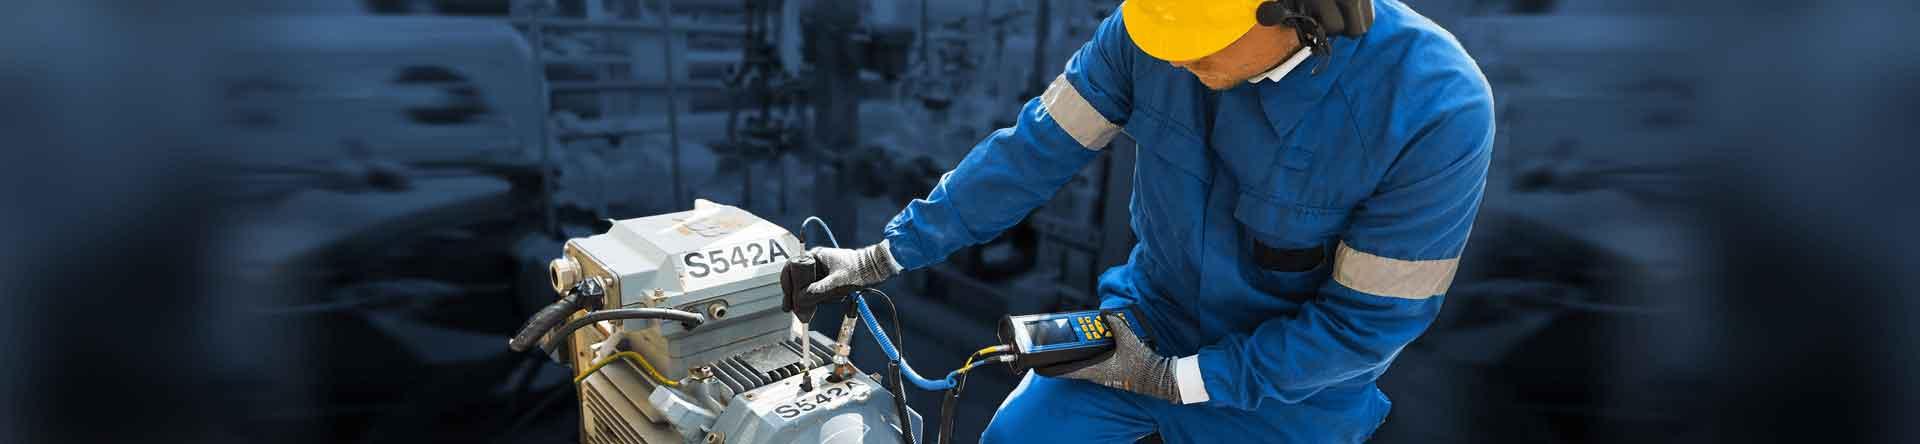 Predictive maintenance equipment